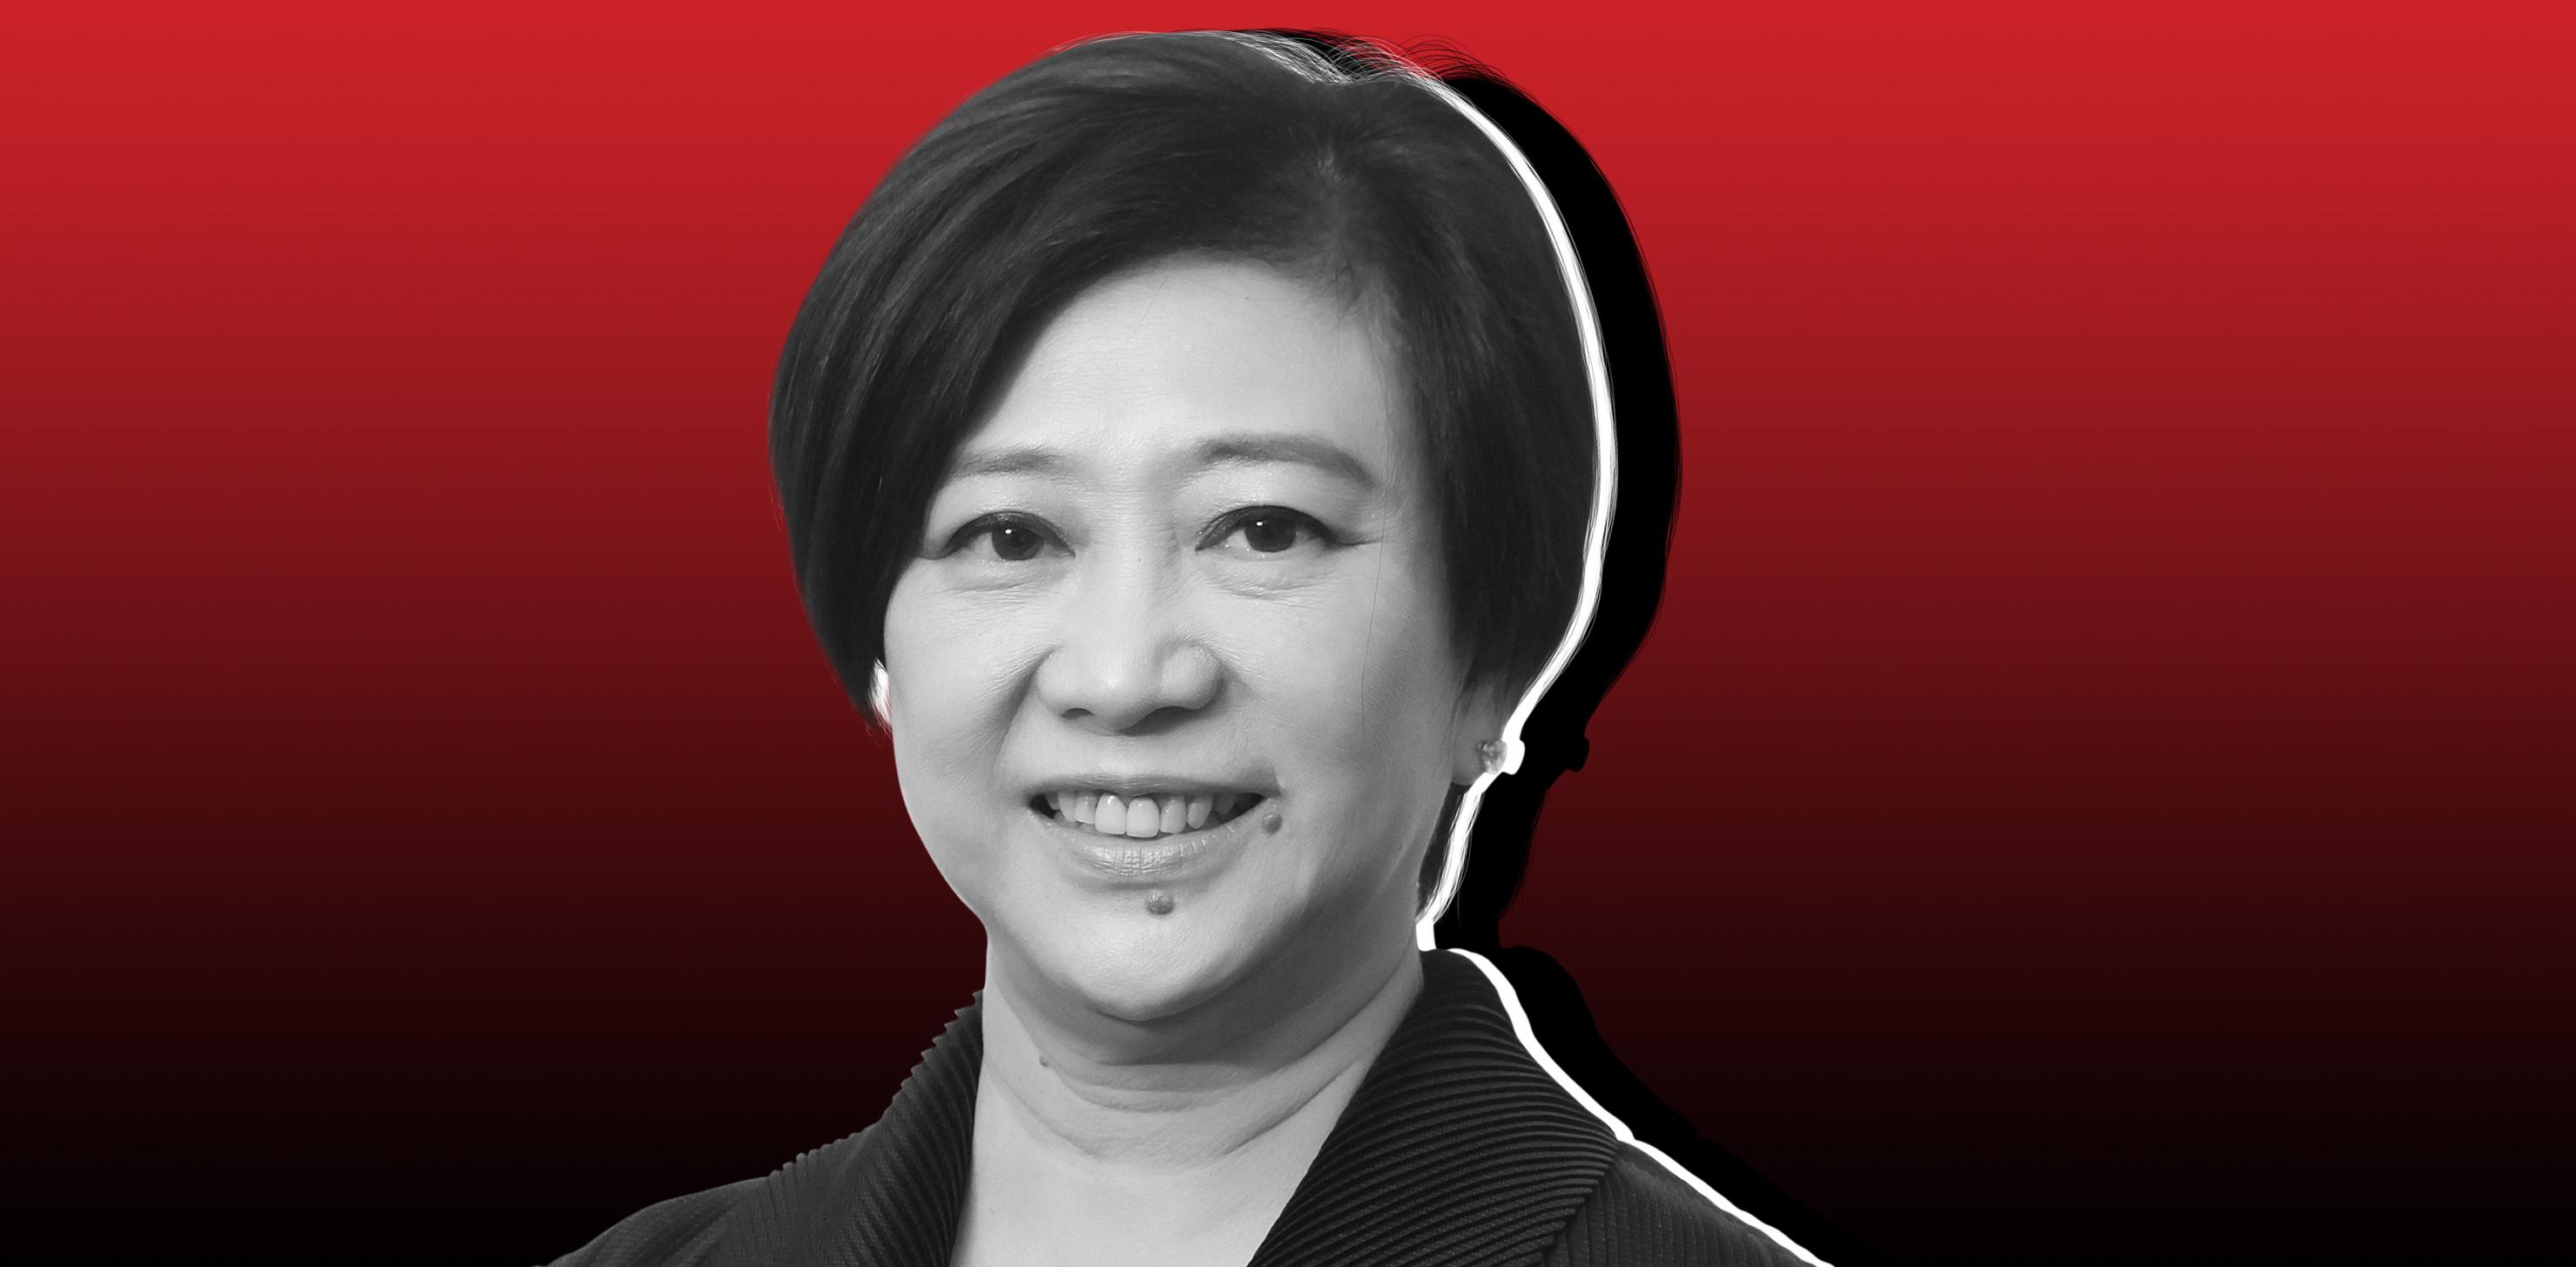 IMPW 2019. 14.Chua Sock Koong